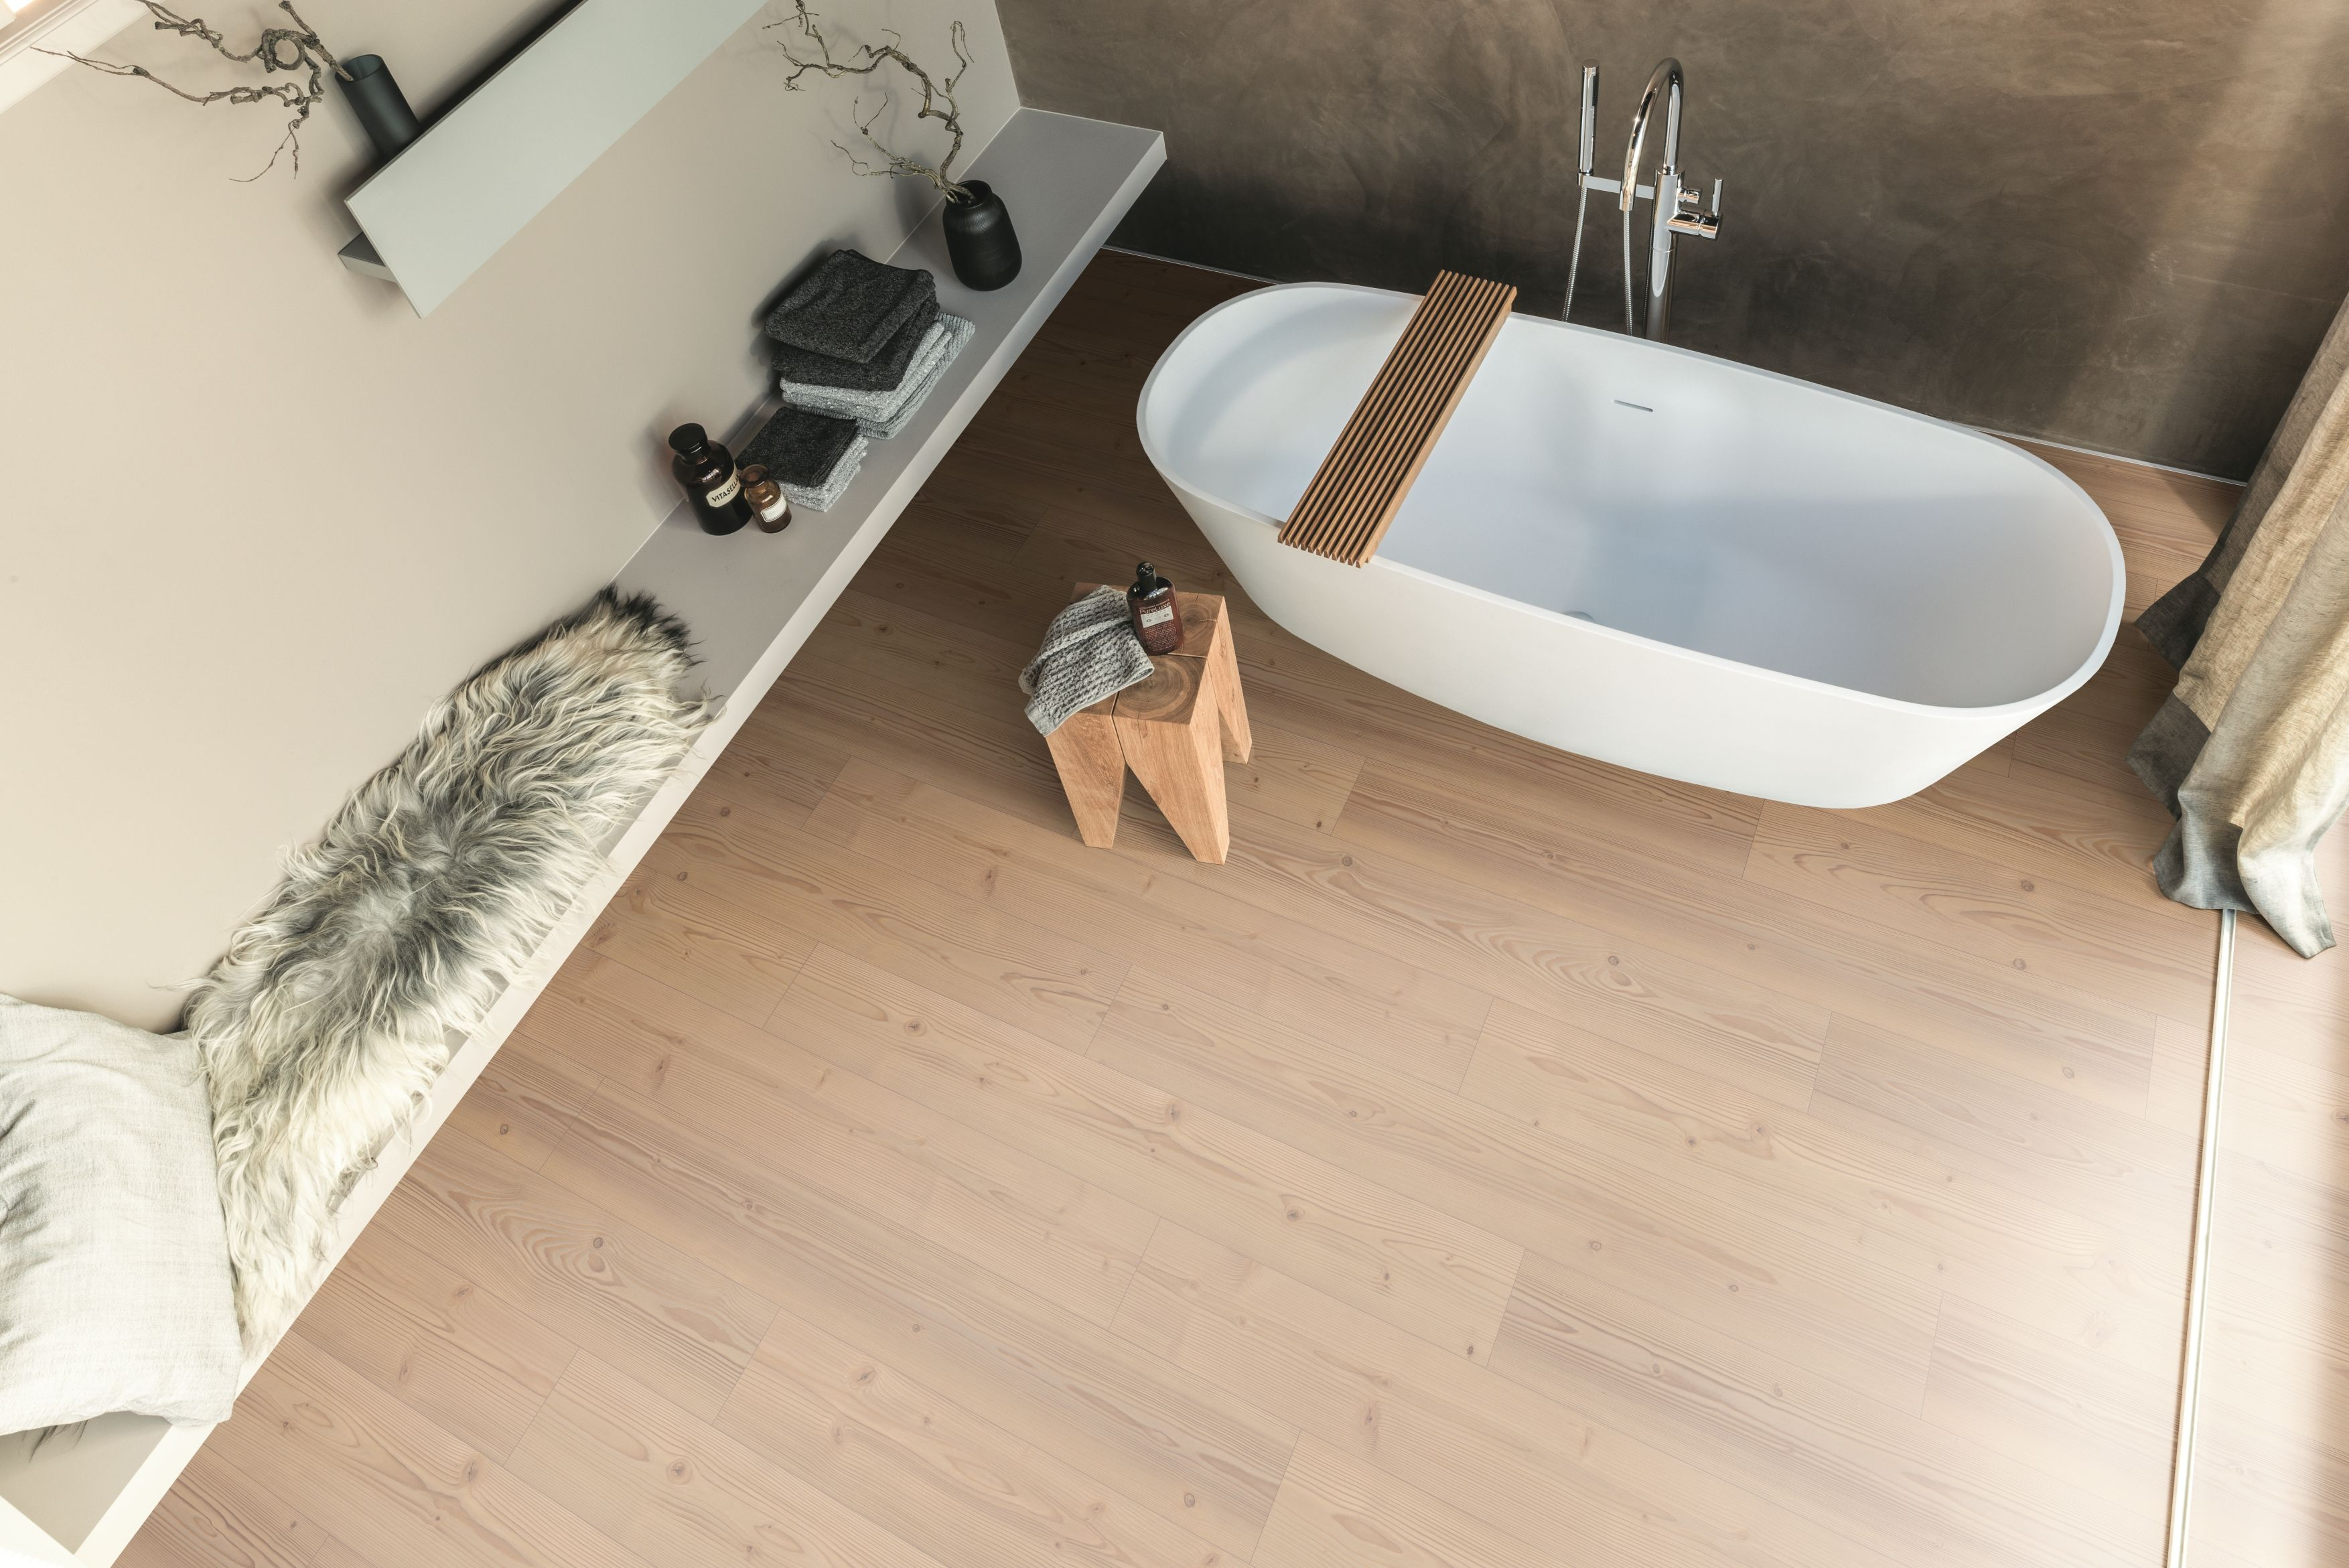 Ref Egger Pro Flooring Epl 031 10 32 Classic Dark Inverey Pine Plancher Sol Stratifie Materiaux